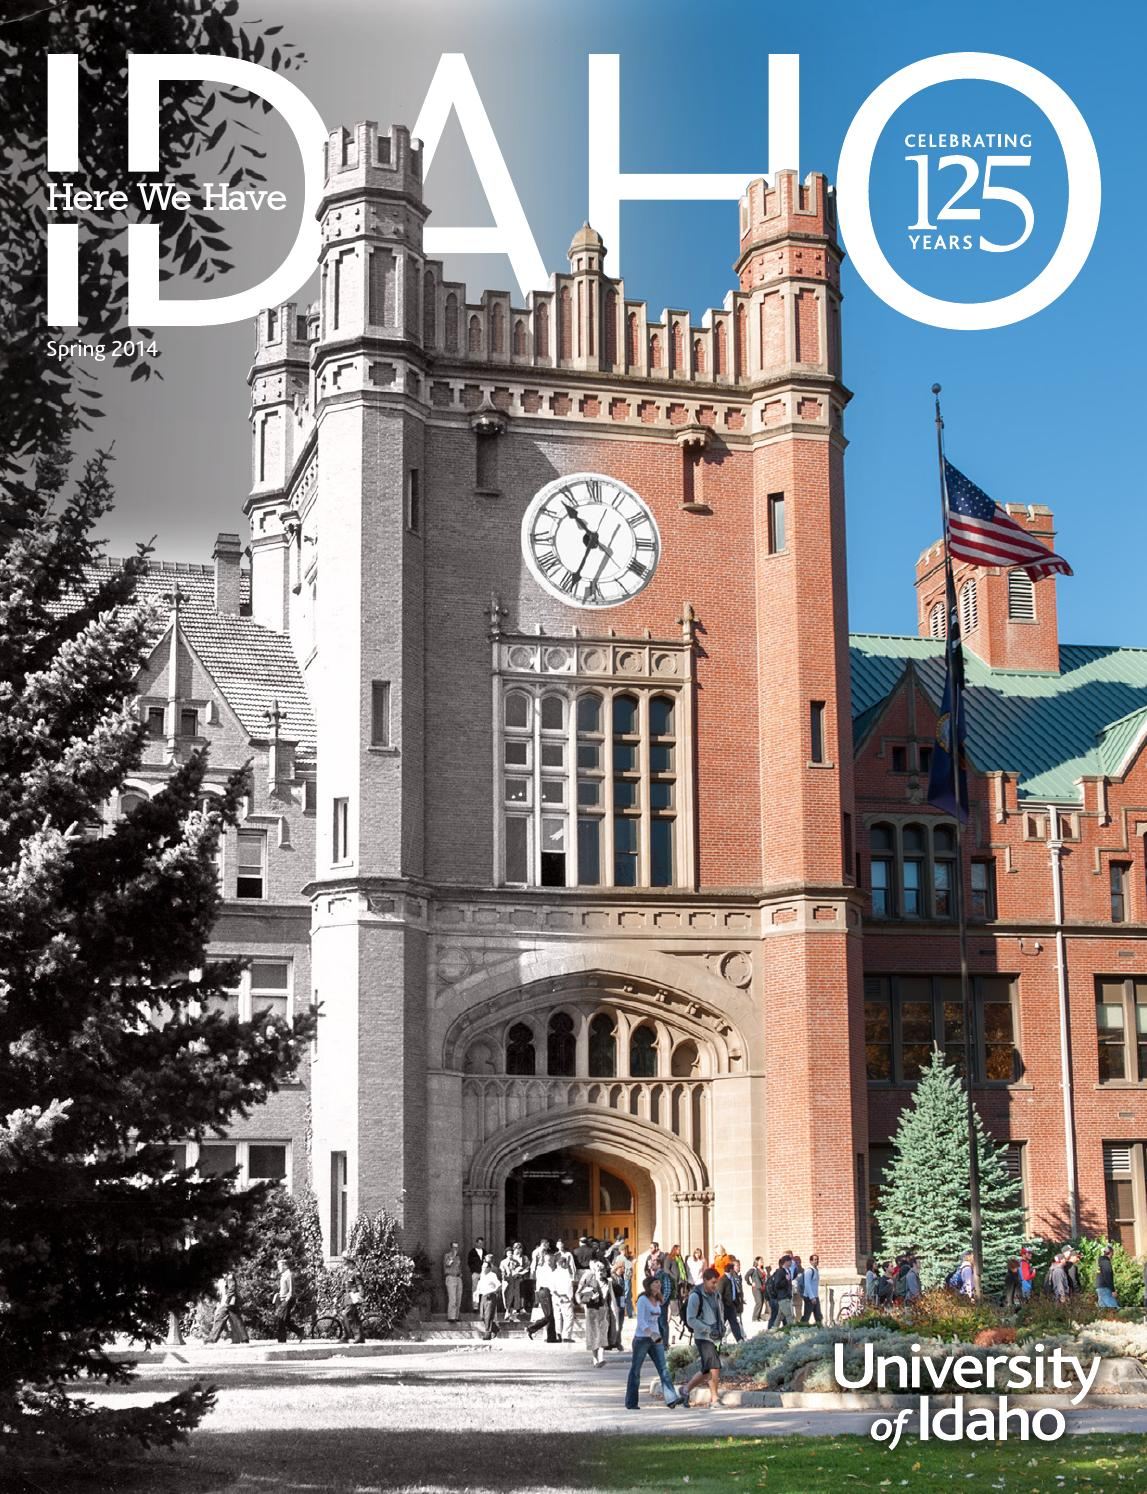 Here We Have Idaho | Spring 2014 by The University of Idaho - issuu